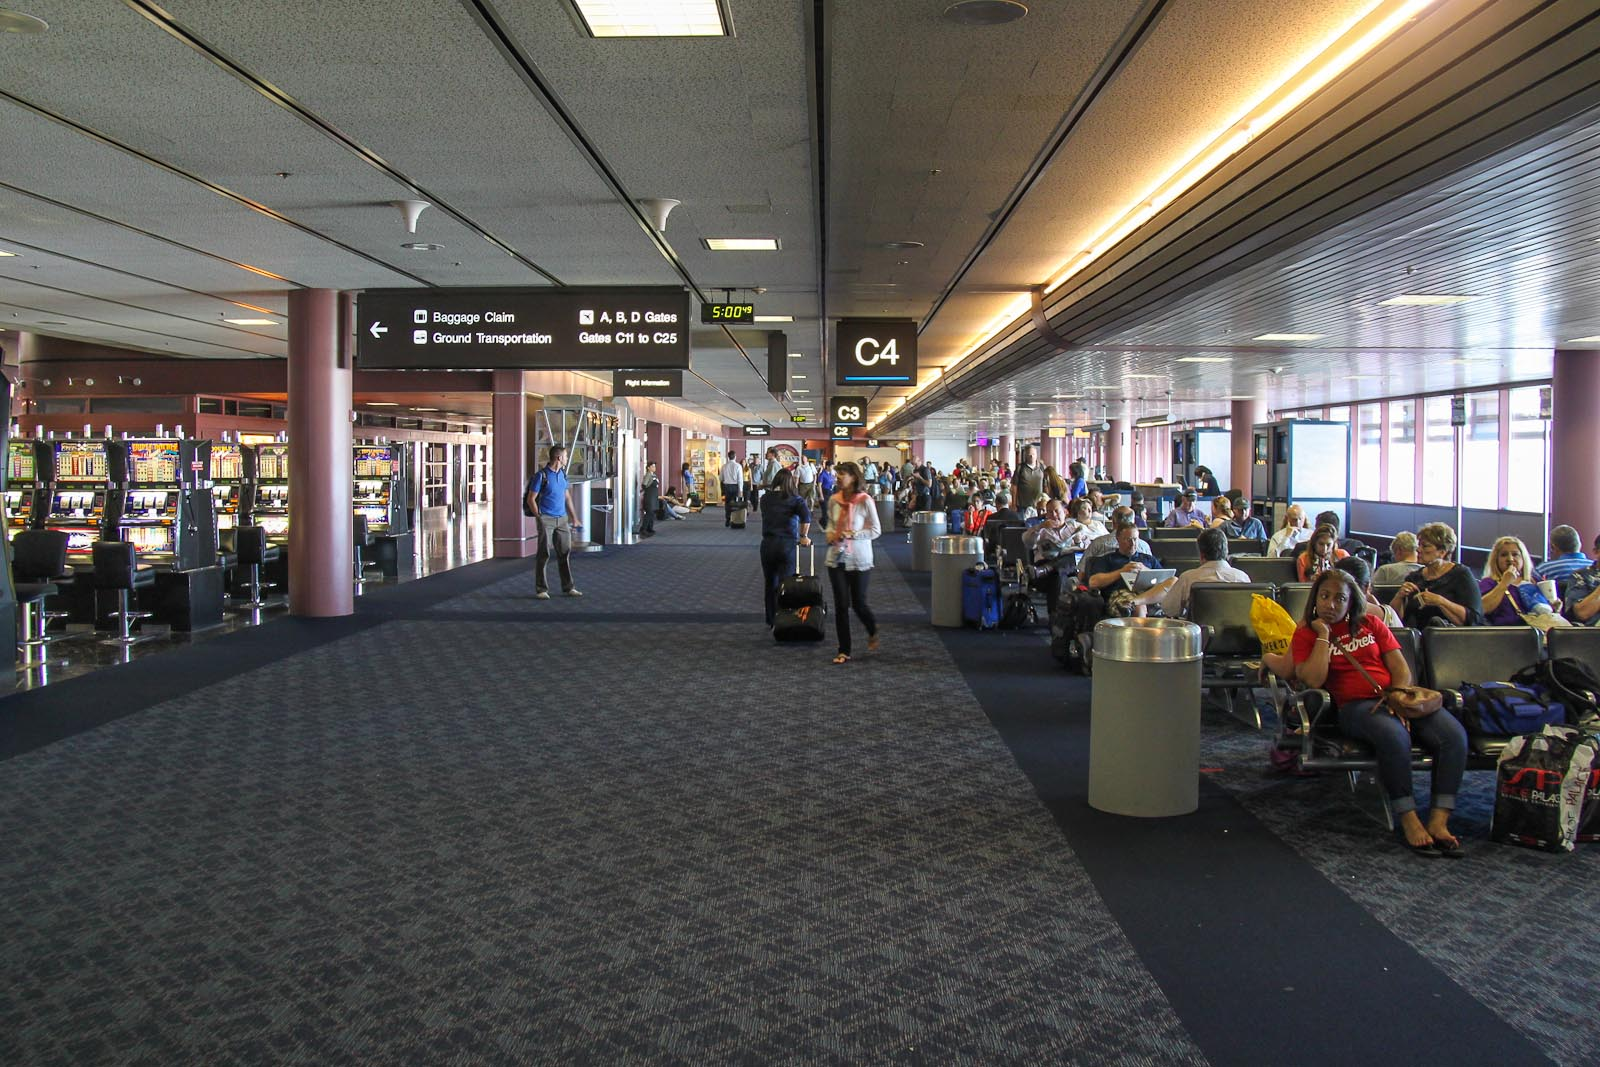 Зал ожидания в конкорсе С терминала 1 аэропорта Лас-Вегаса Мак-Каран